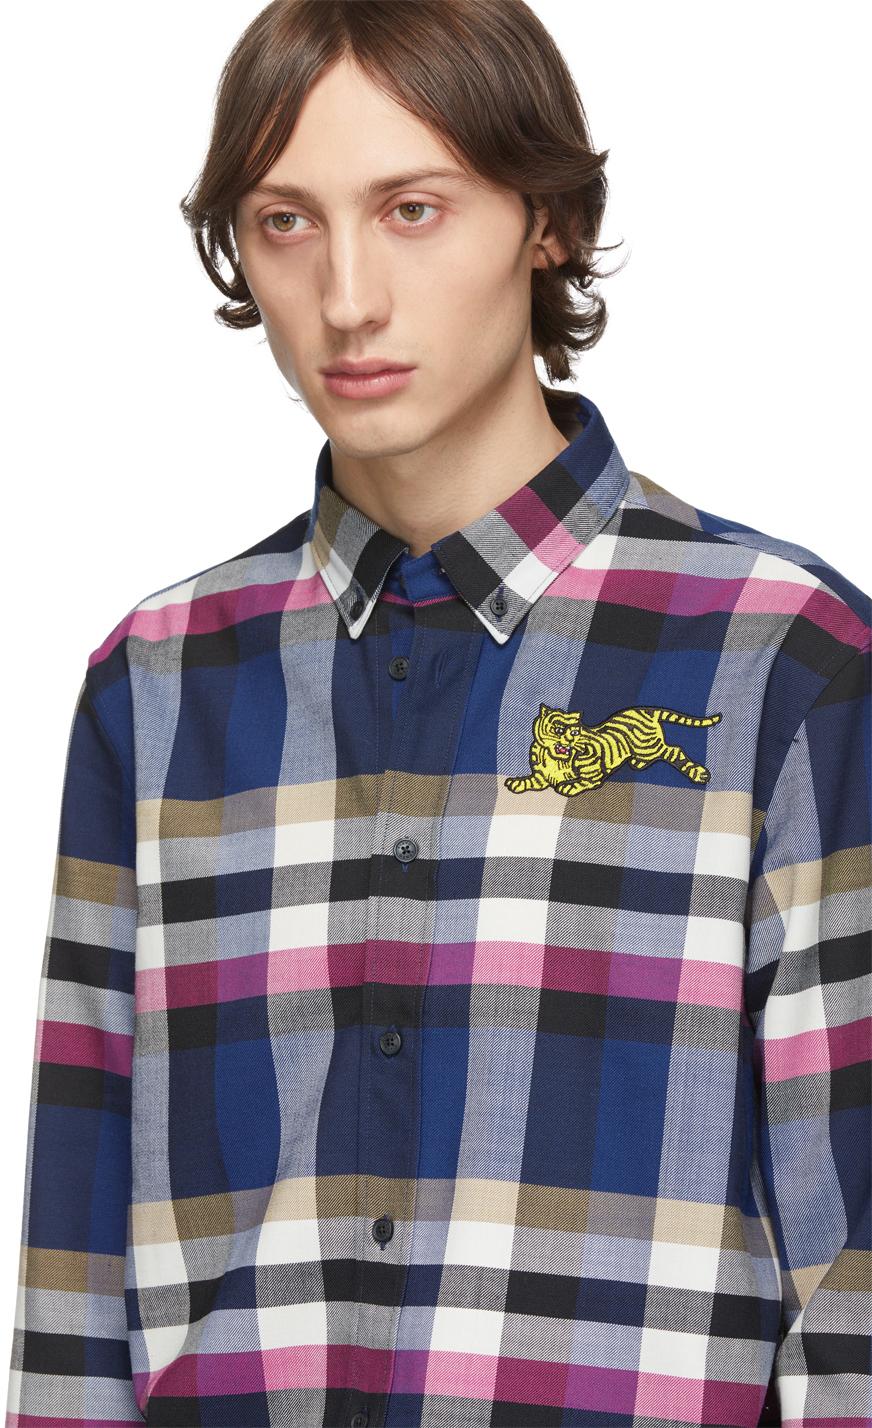 KENZO Downs Navy Jumping Tiger Crest Shirt